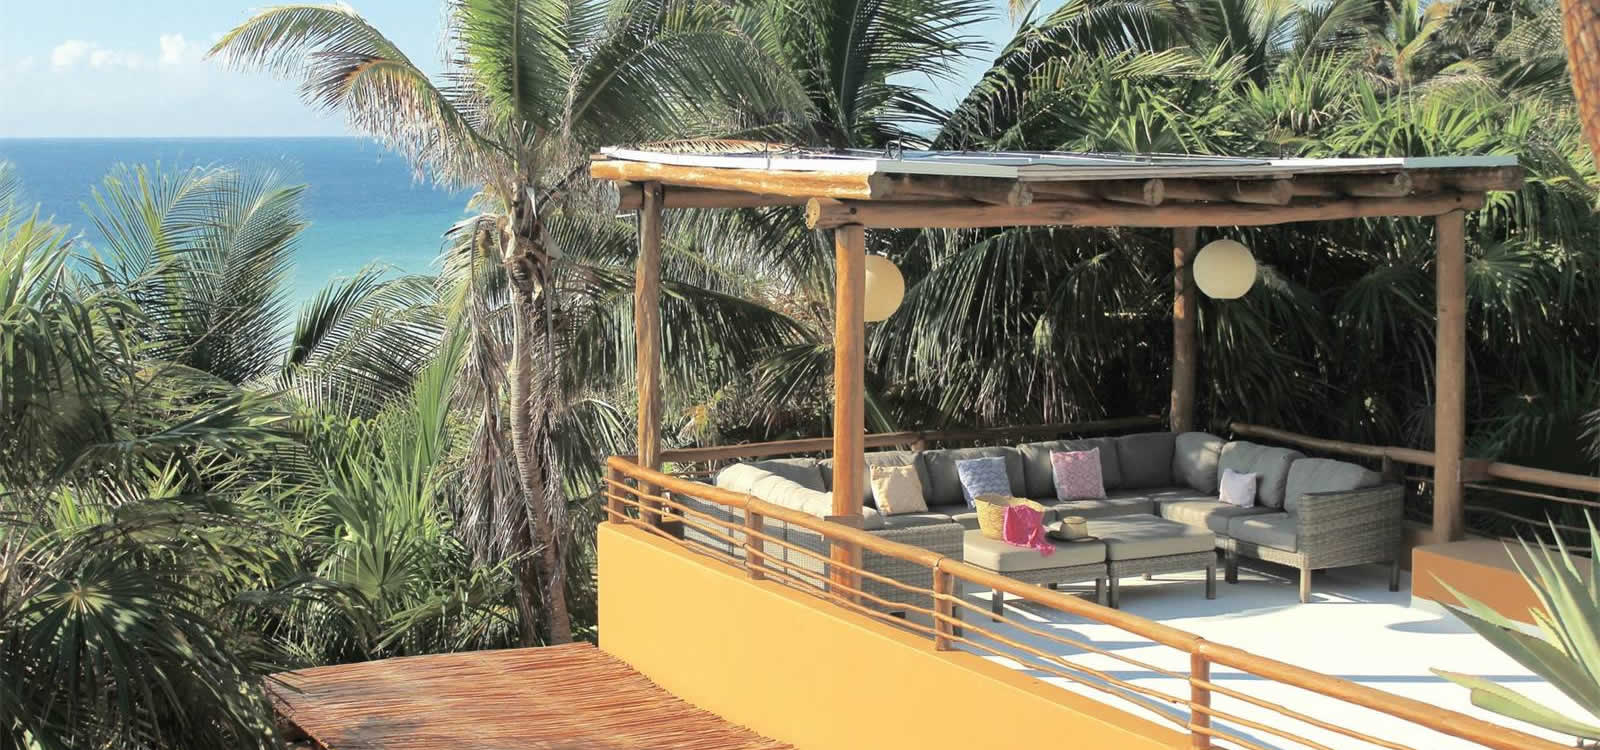 Mexico Tulum Luxury Beachfront Home For Sale 3 7th